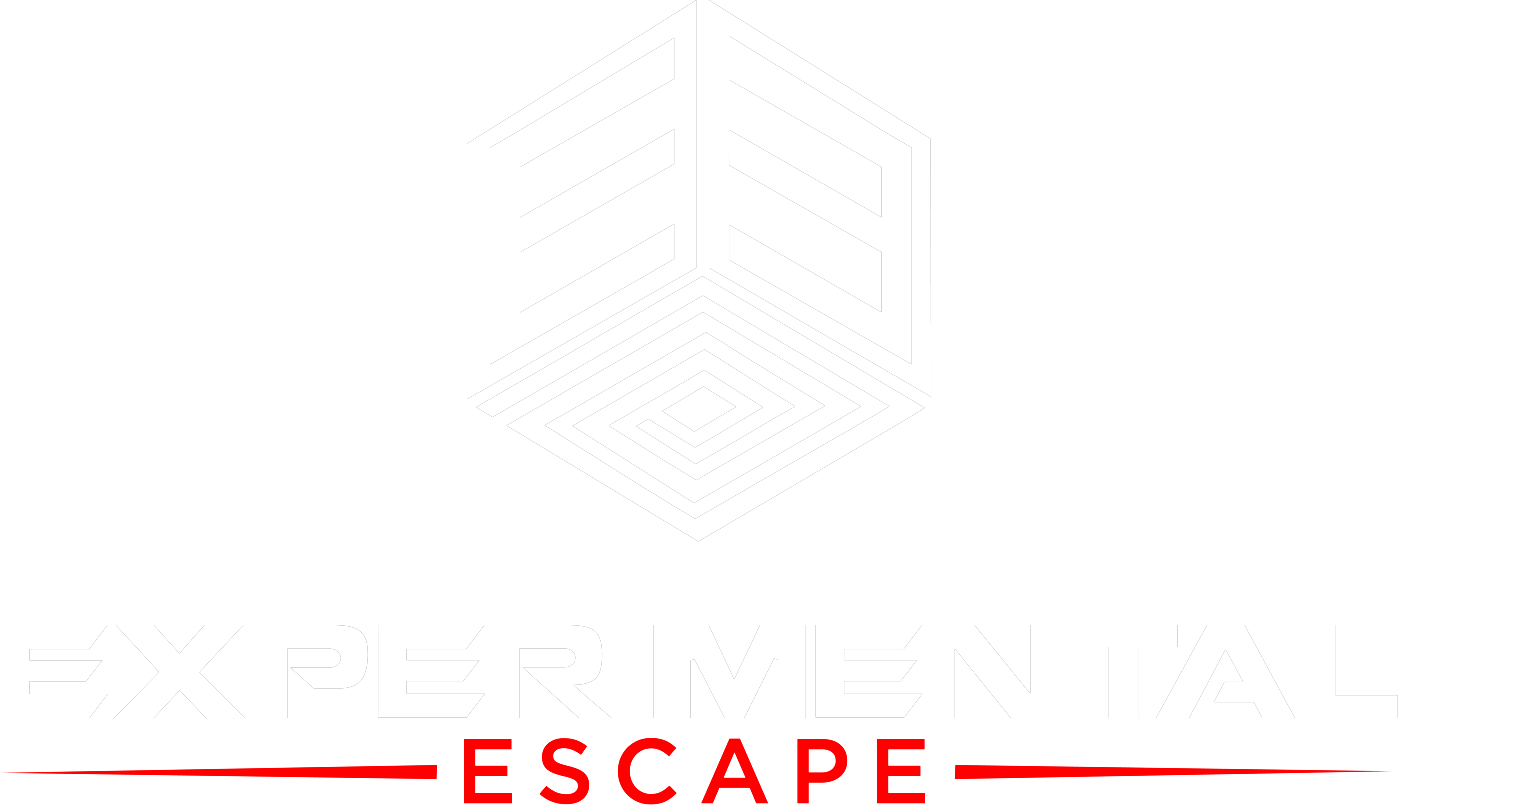 experimental-escape-leamington-spa-logo